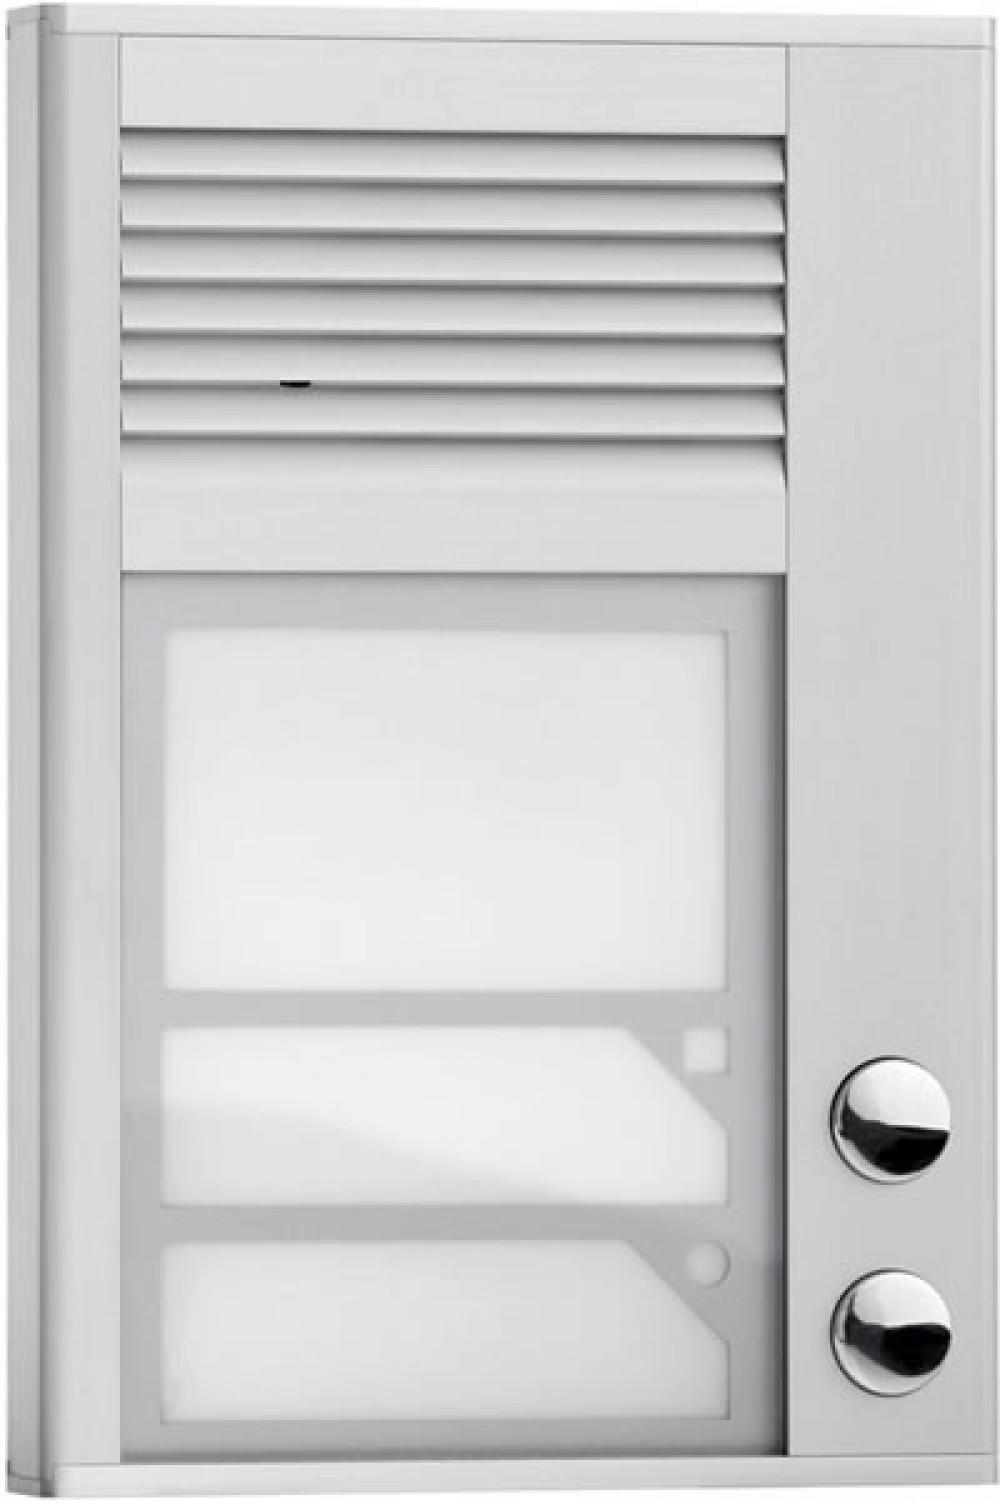 nterquartz ID202 2 Button Doorphone Entry System